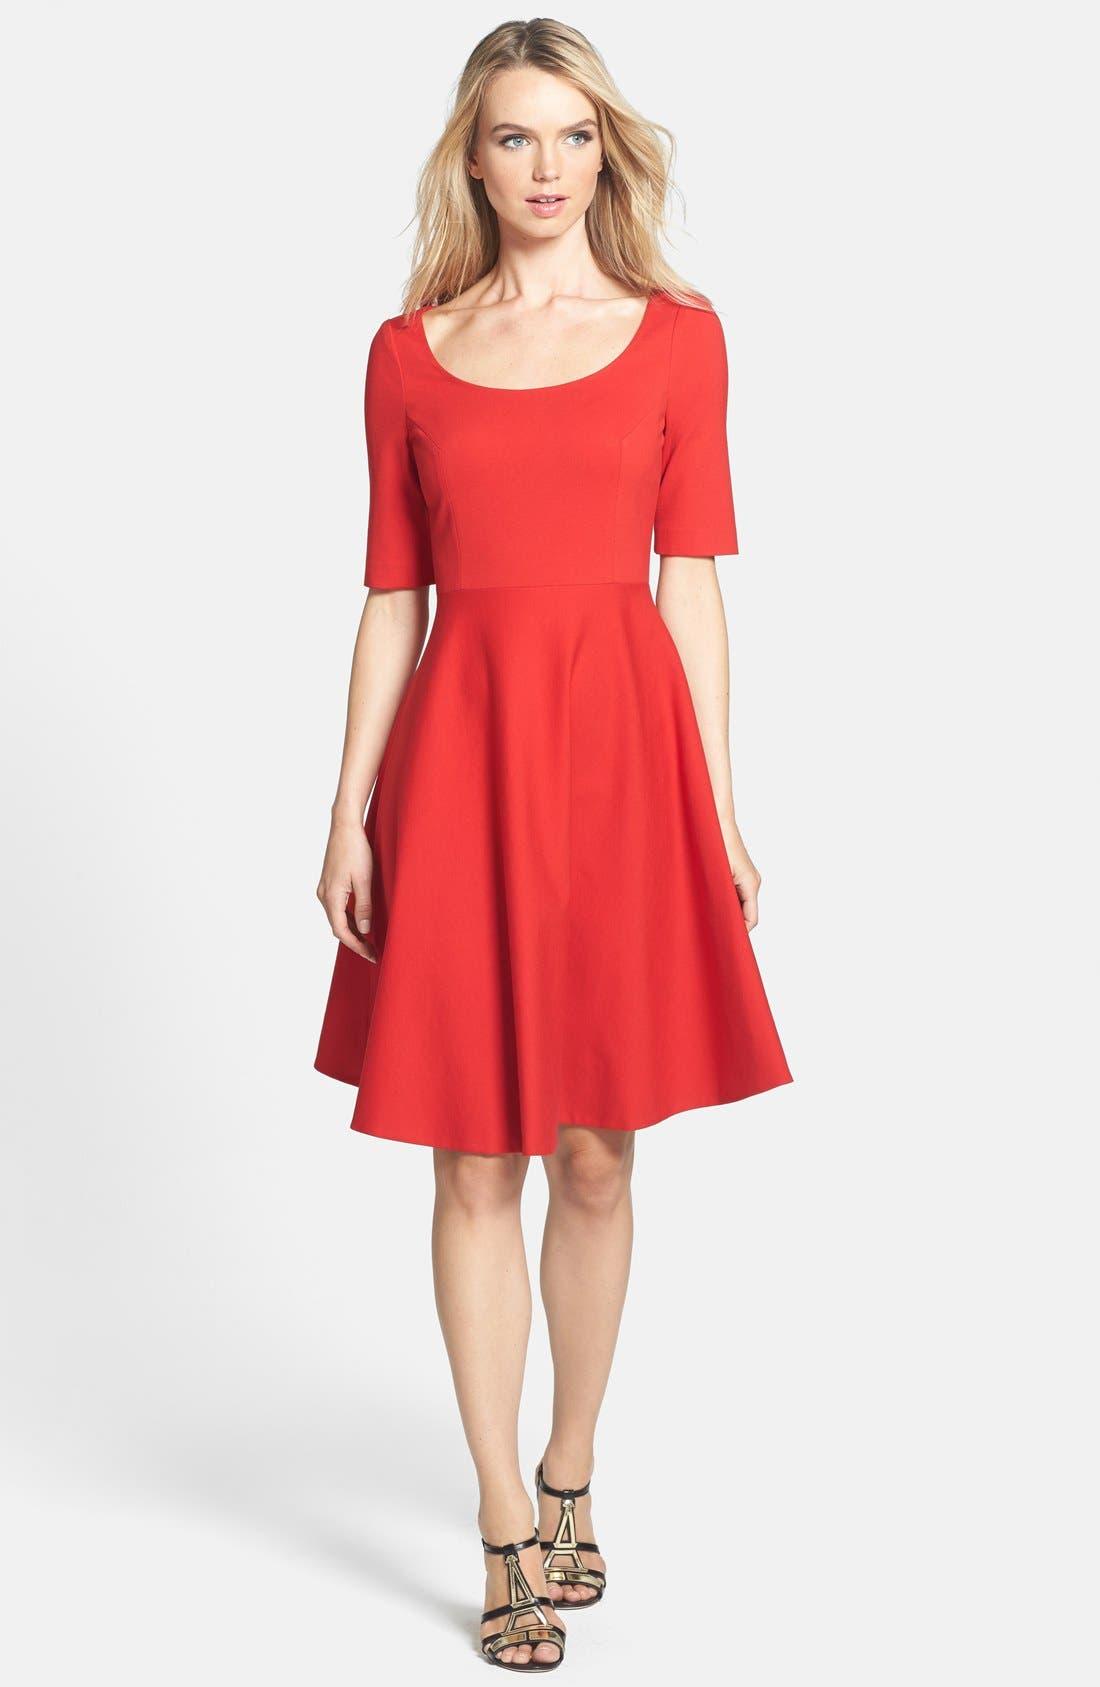 Main Image - kate spade new york 'jada' stretch fit & flare dress